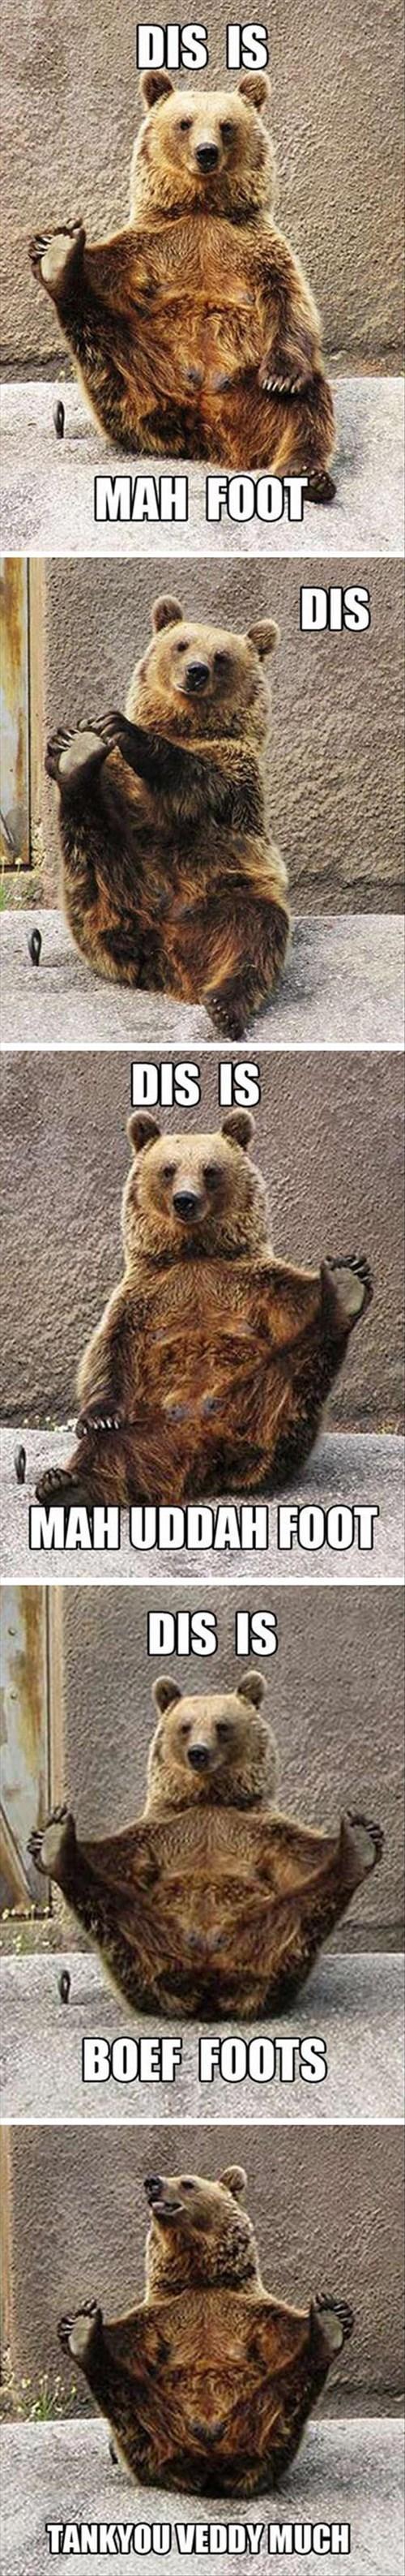 bears feet funny - 8085427968